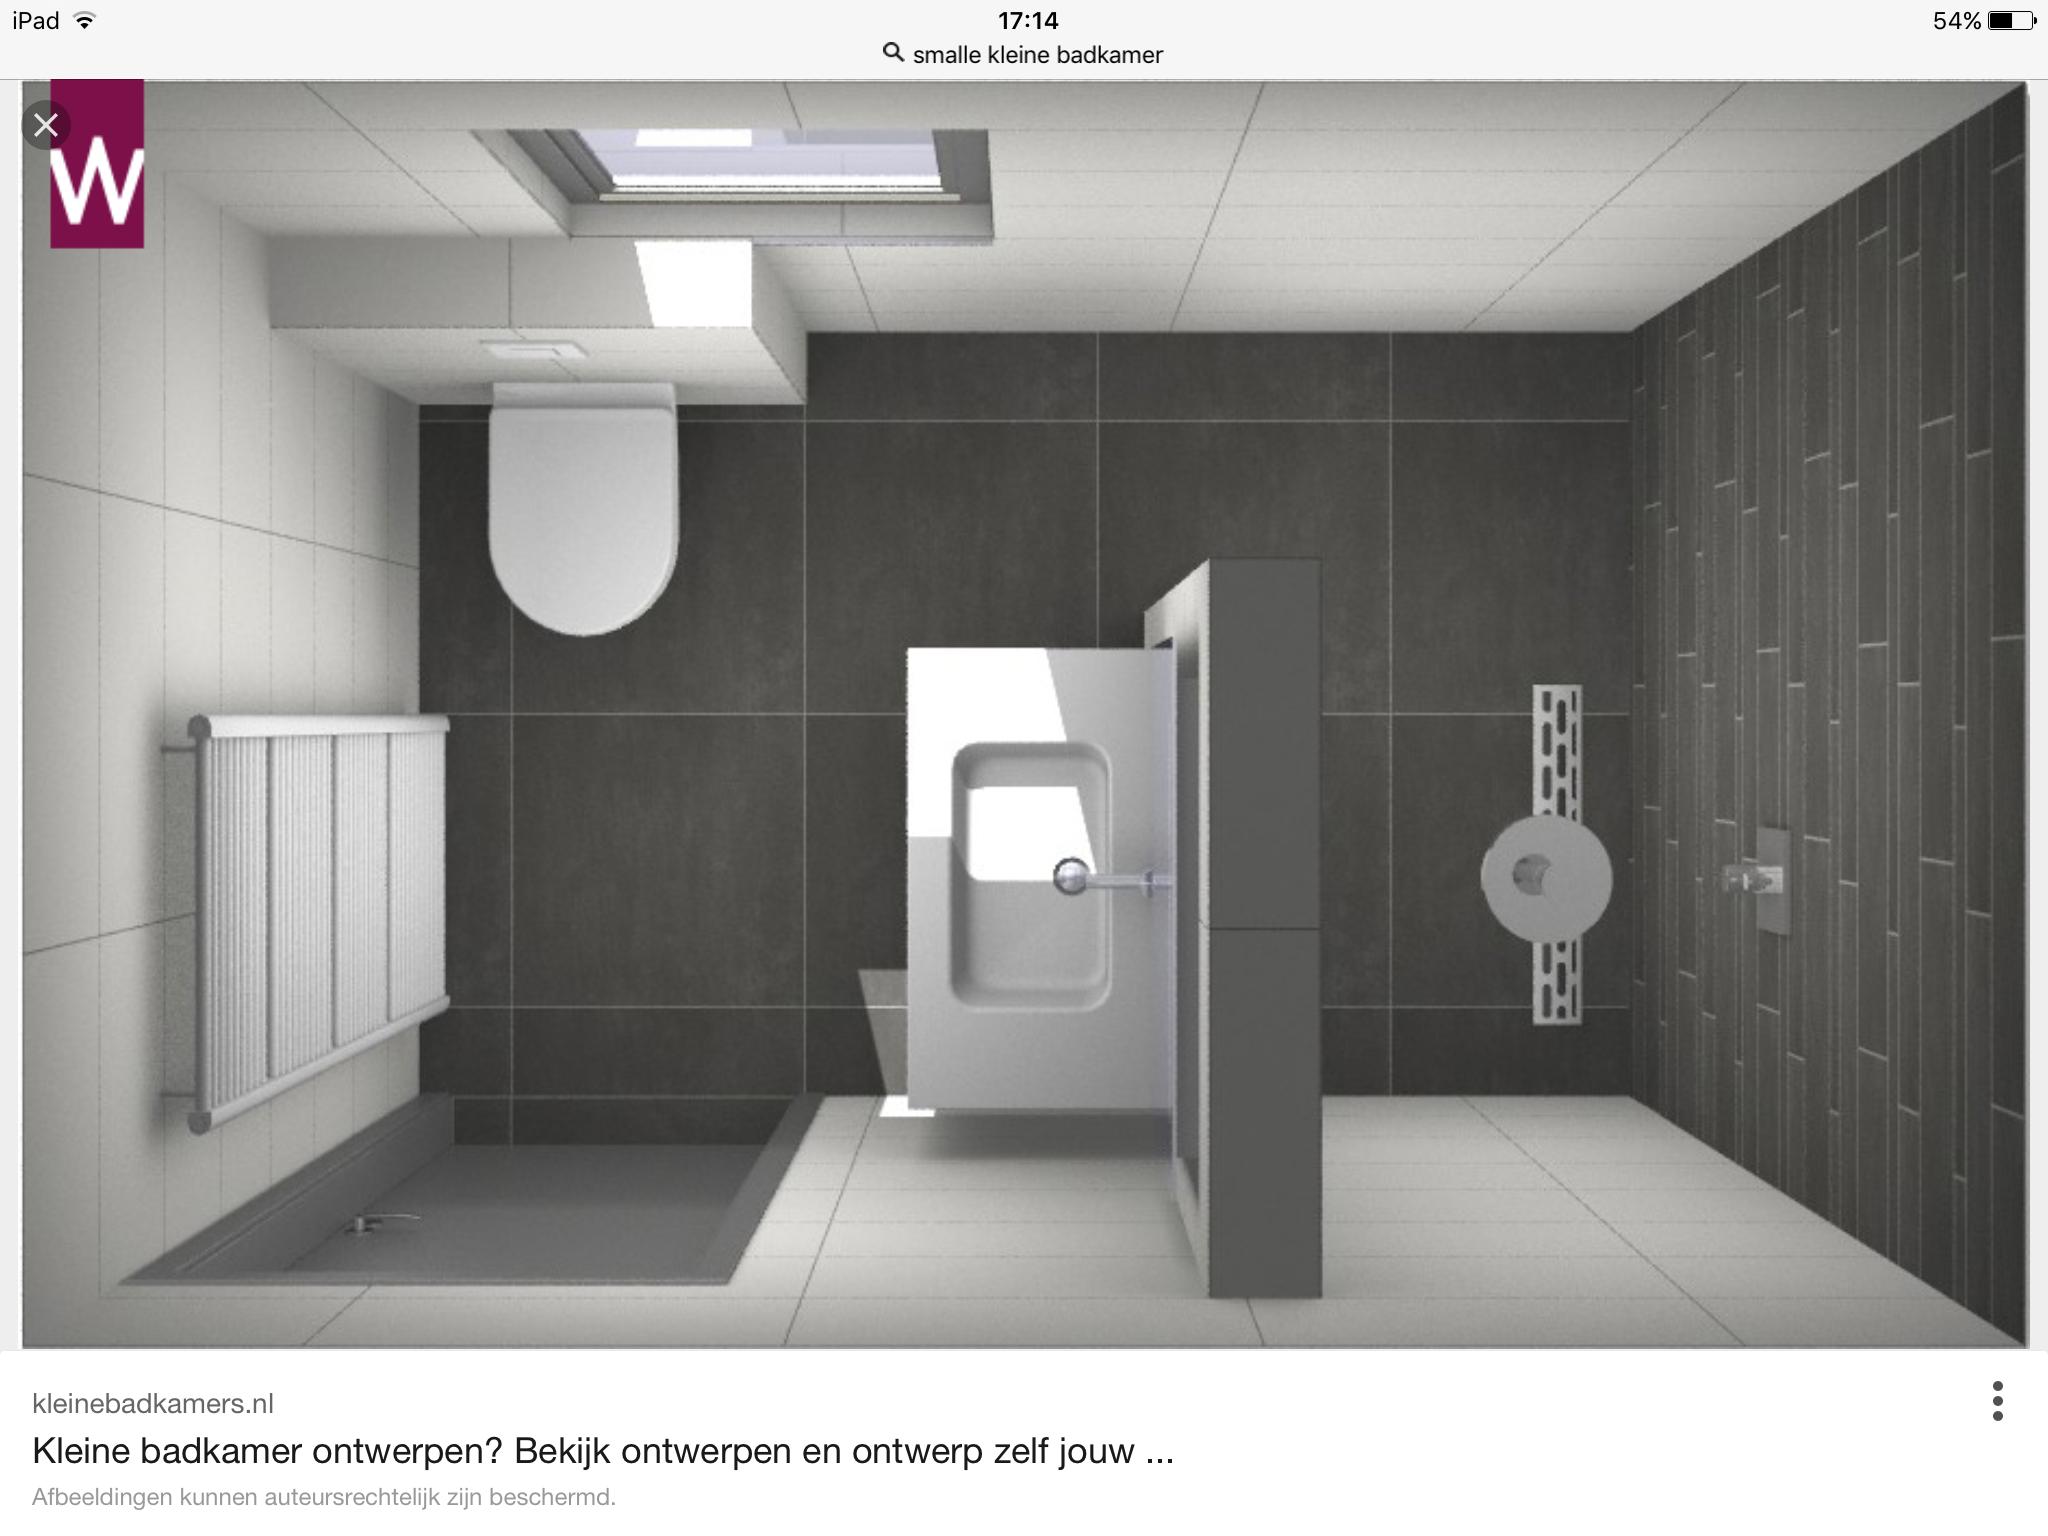 Banyooo - Interioare | Pinterest - Badkamer, Wc en Interieur